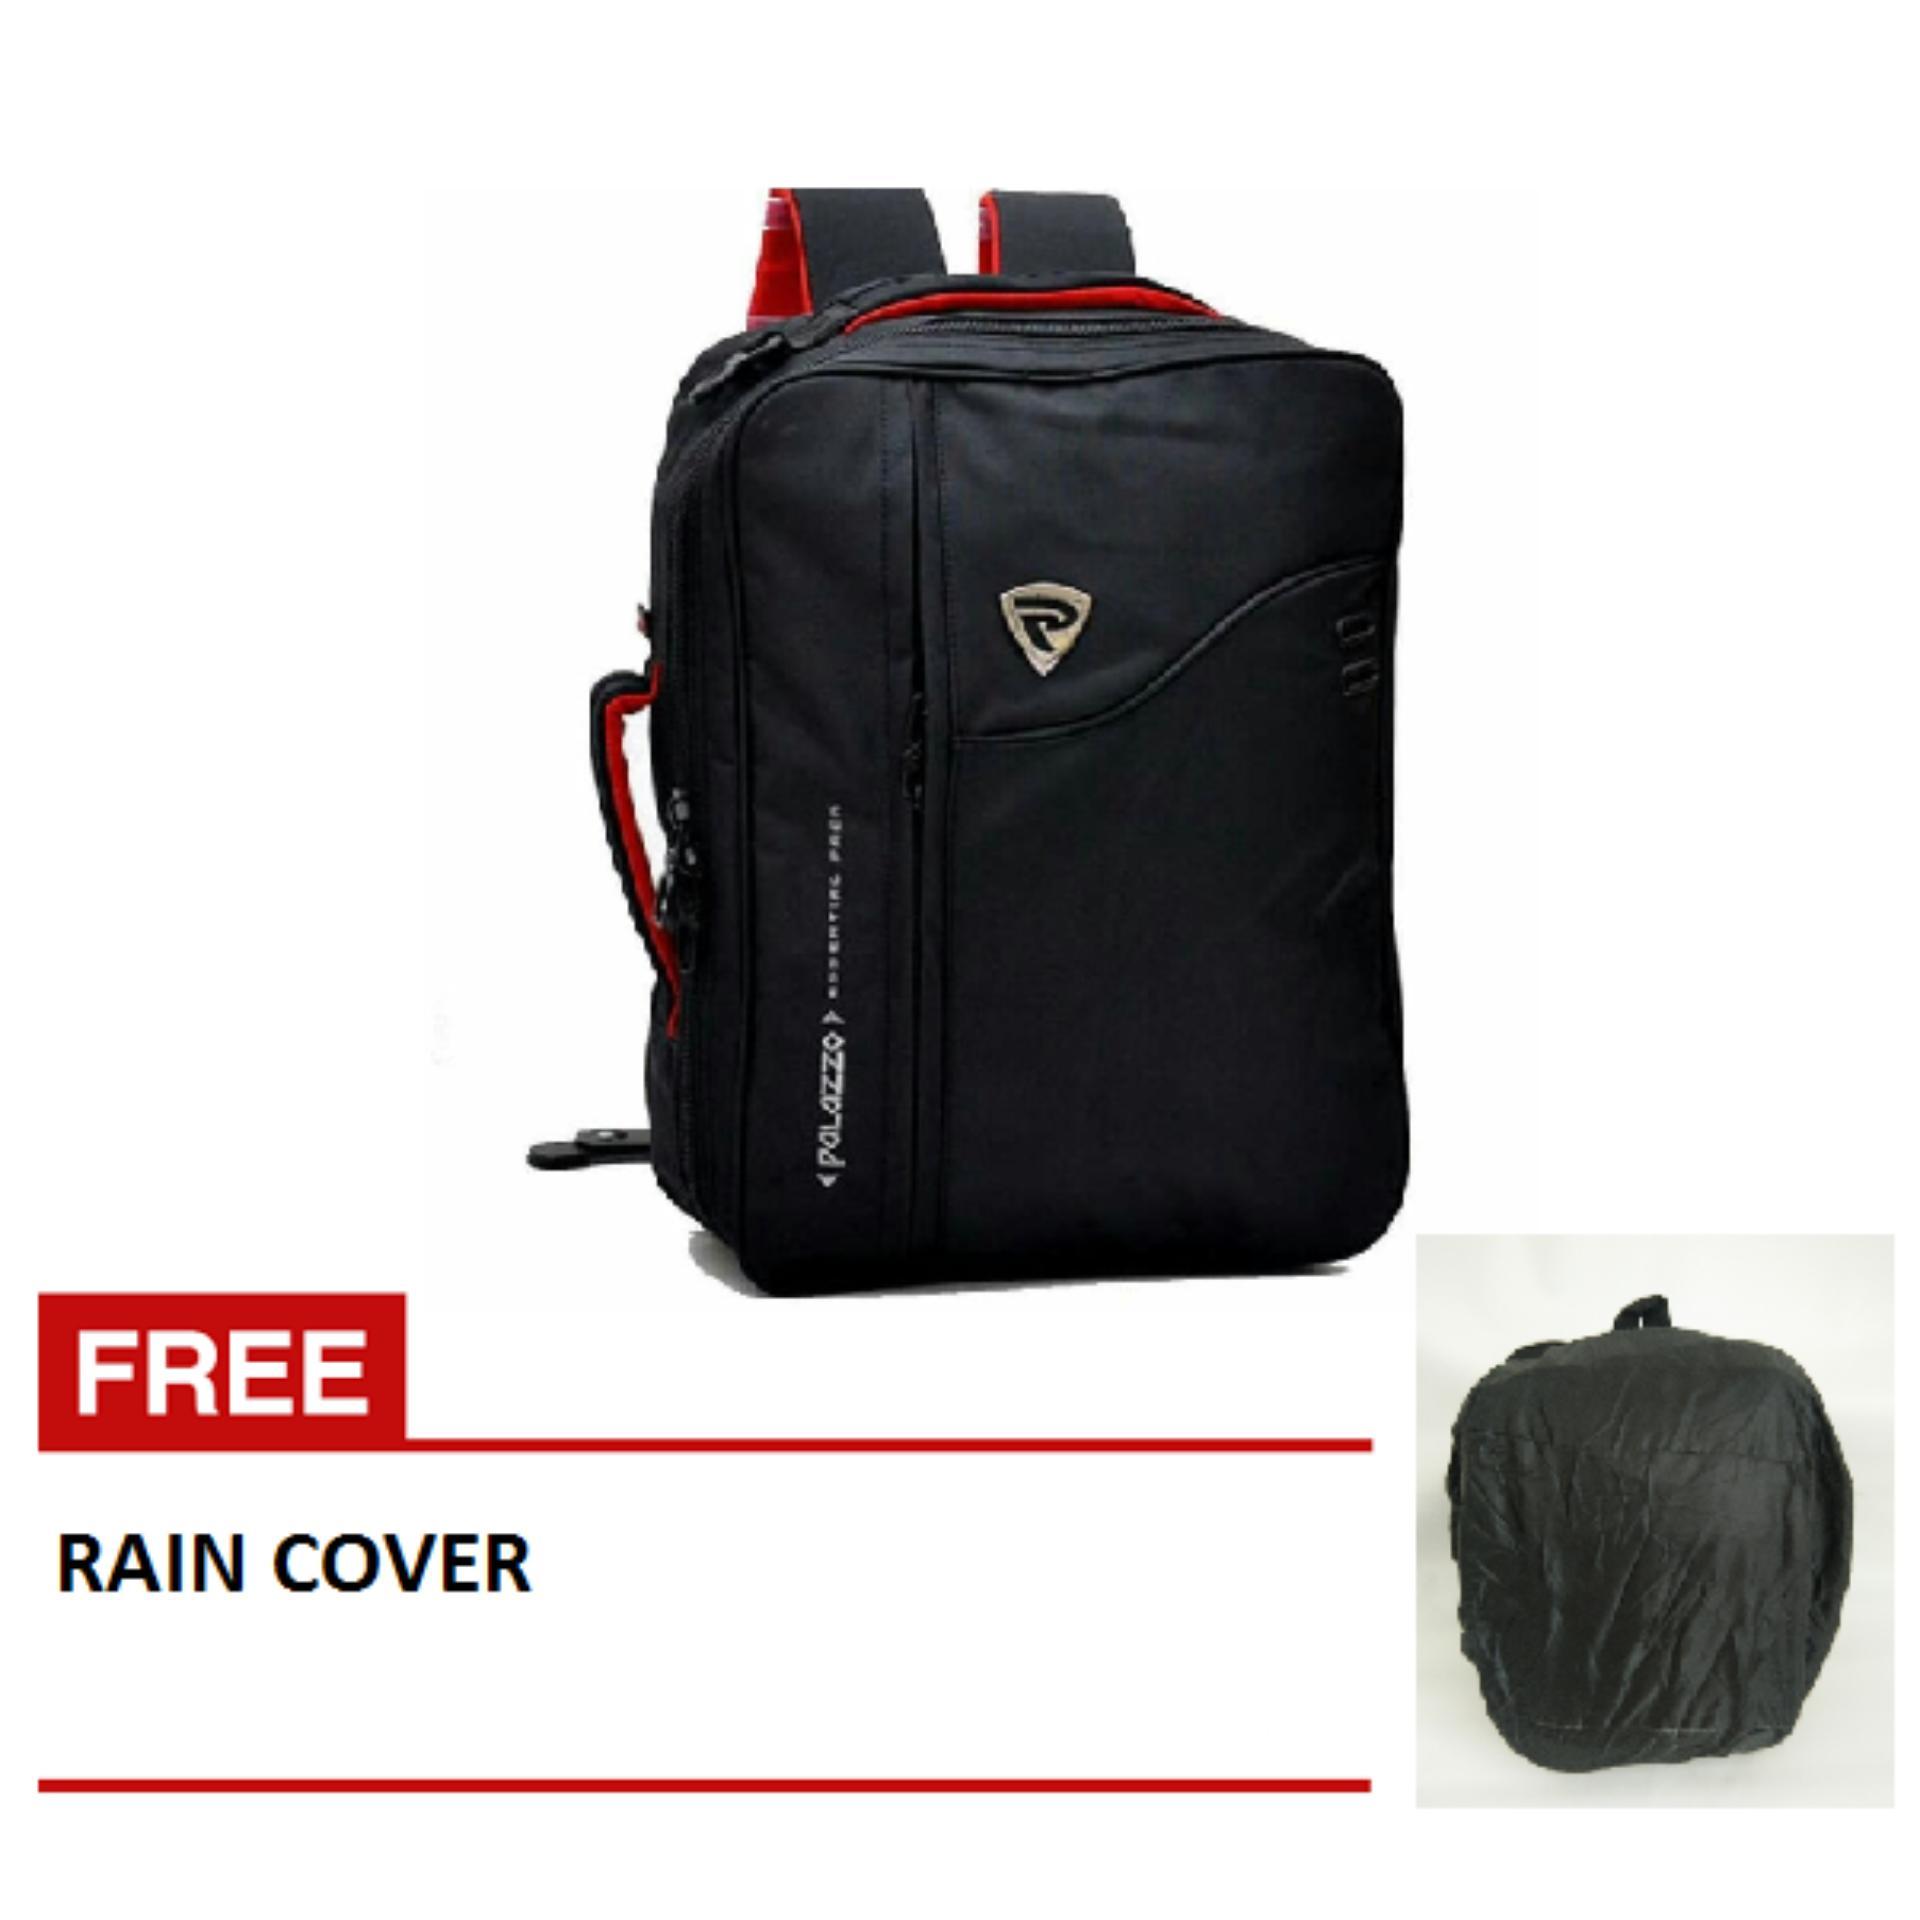 Harga Hemat Palazzo Tas 3In1 Ransel Selempang Jinjing 34685 Raincoat Jas Hujan Hitam